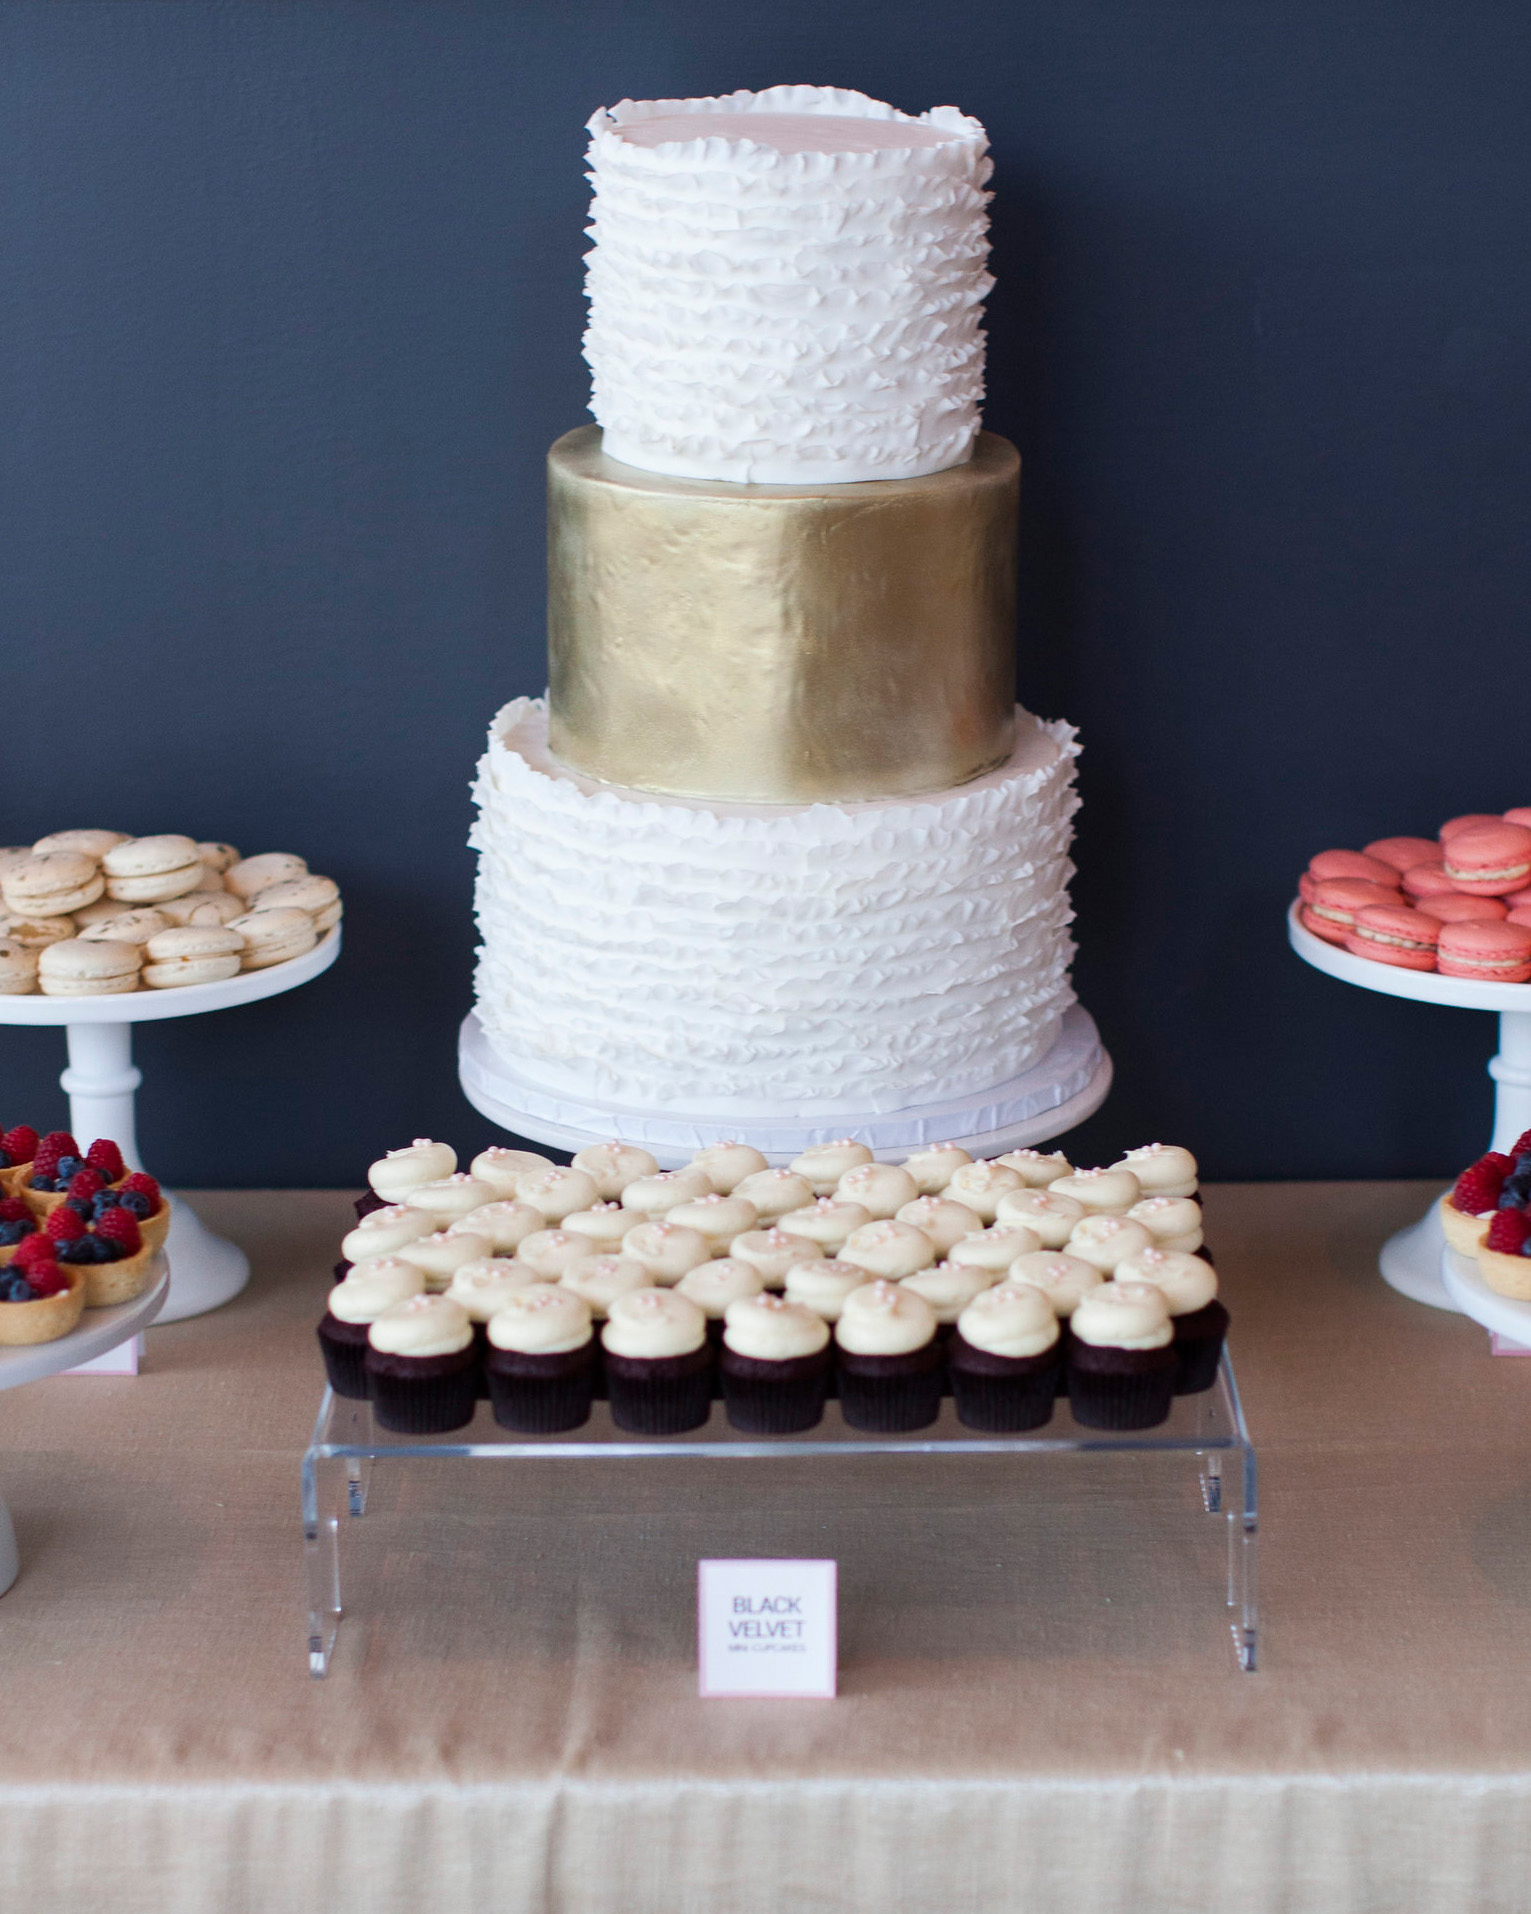 ashley-ryan-wedding-cake-6485-s111852-0415.jpg